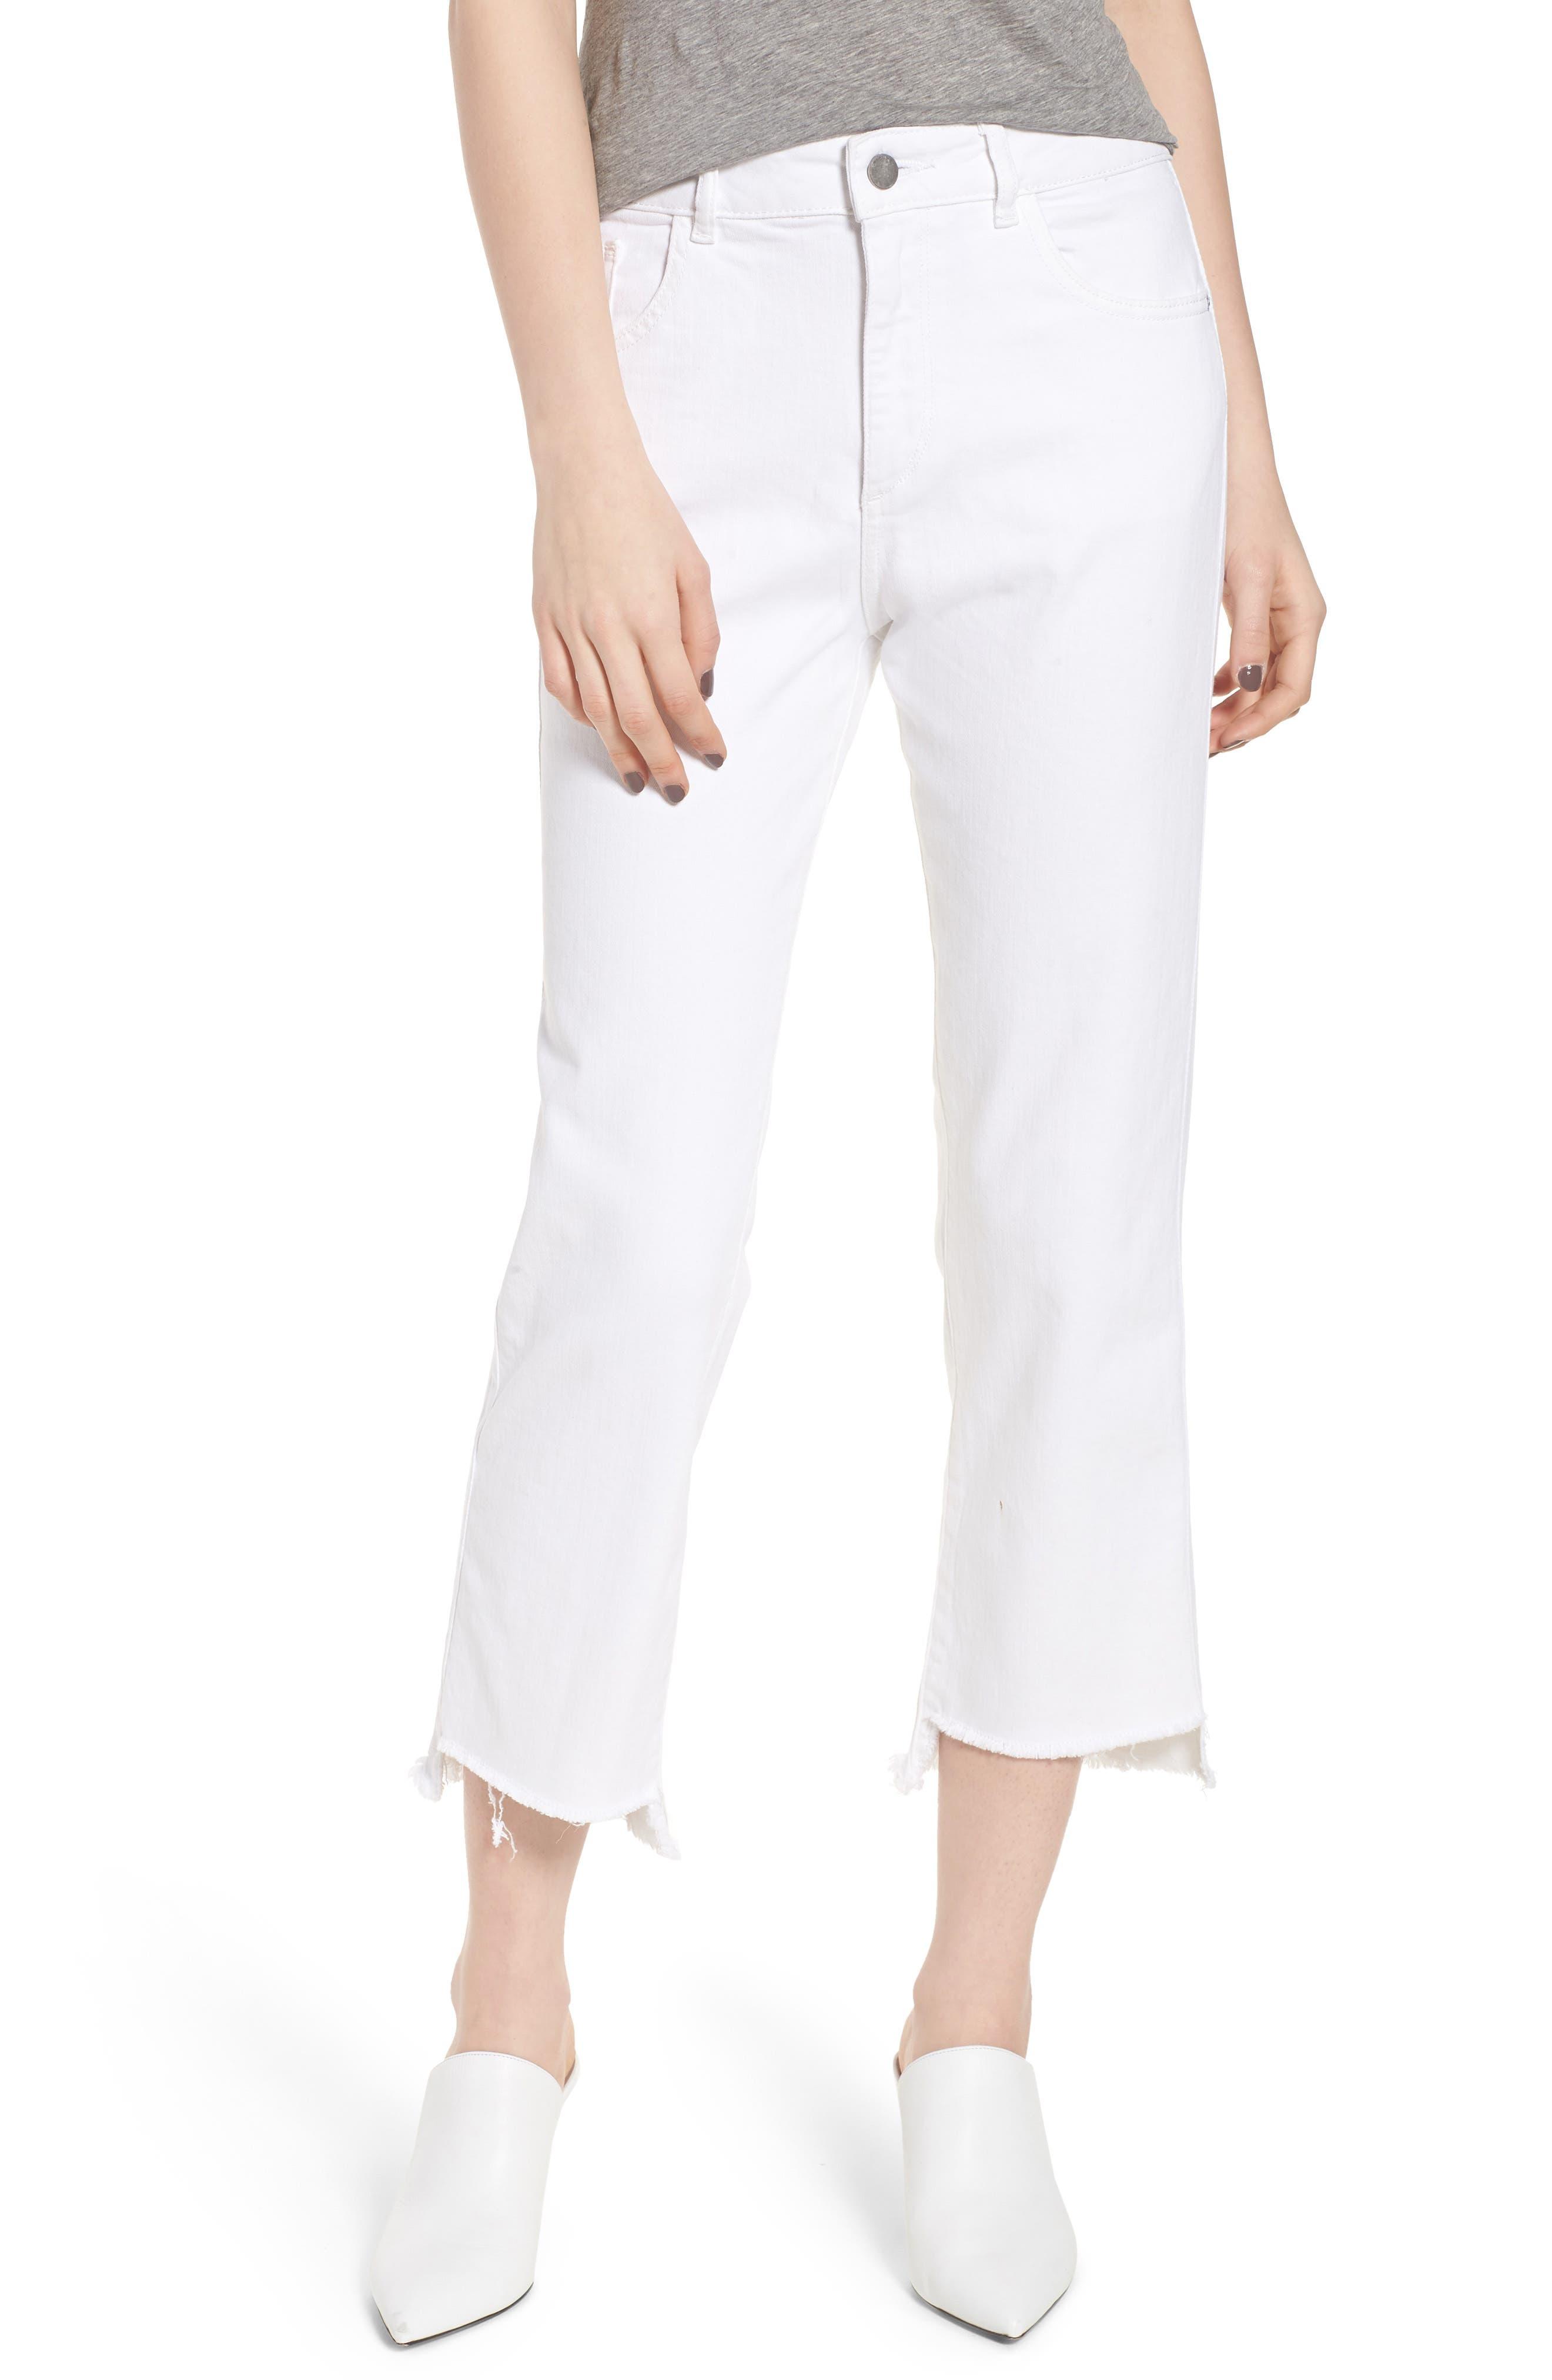 Patti High Waist Crop Straight Leg Jeans,                         Main,                         color,